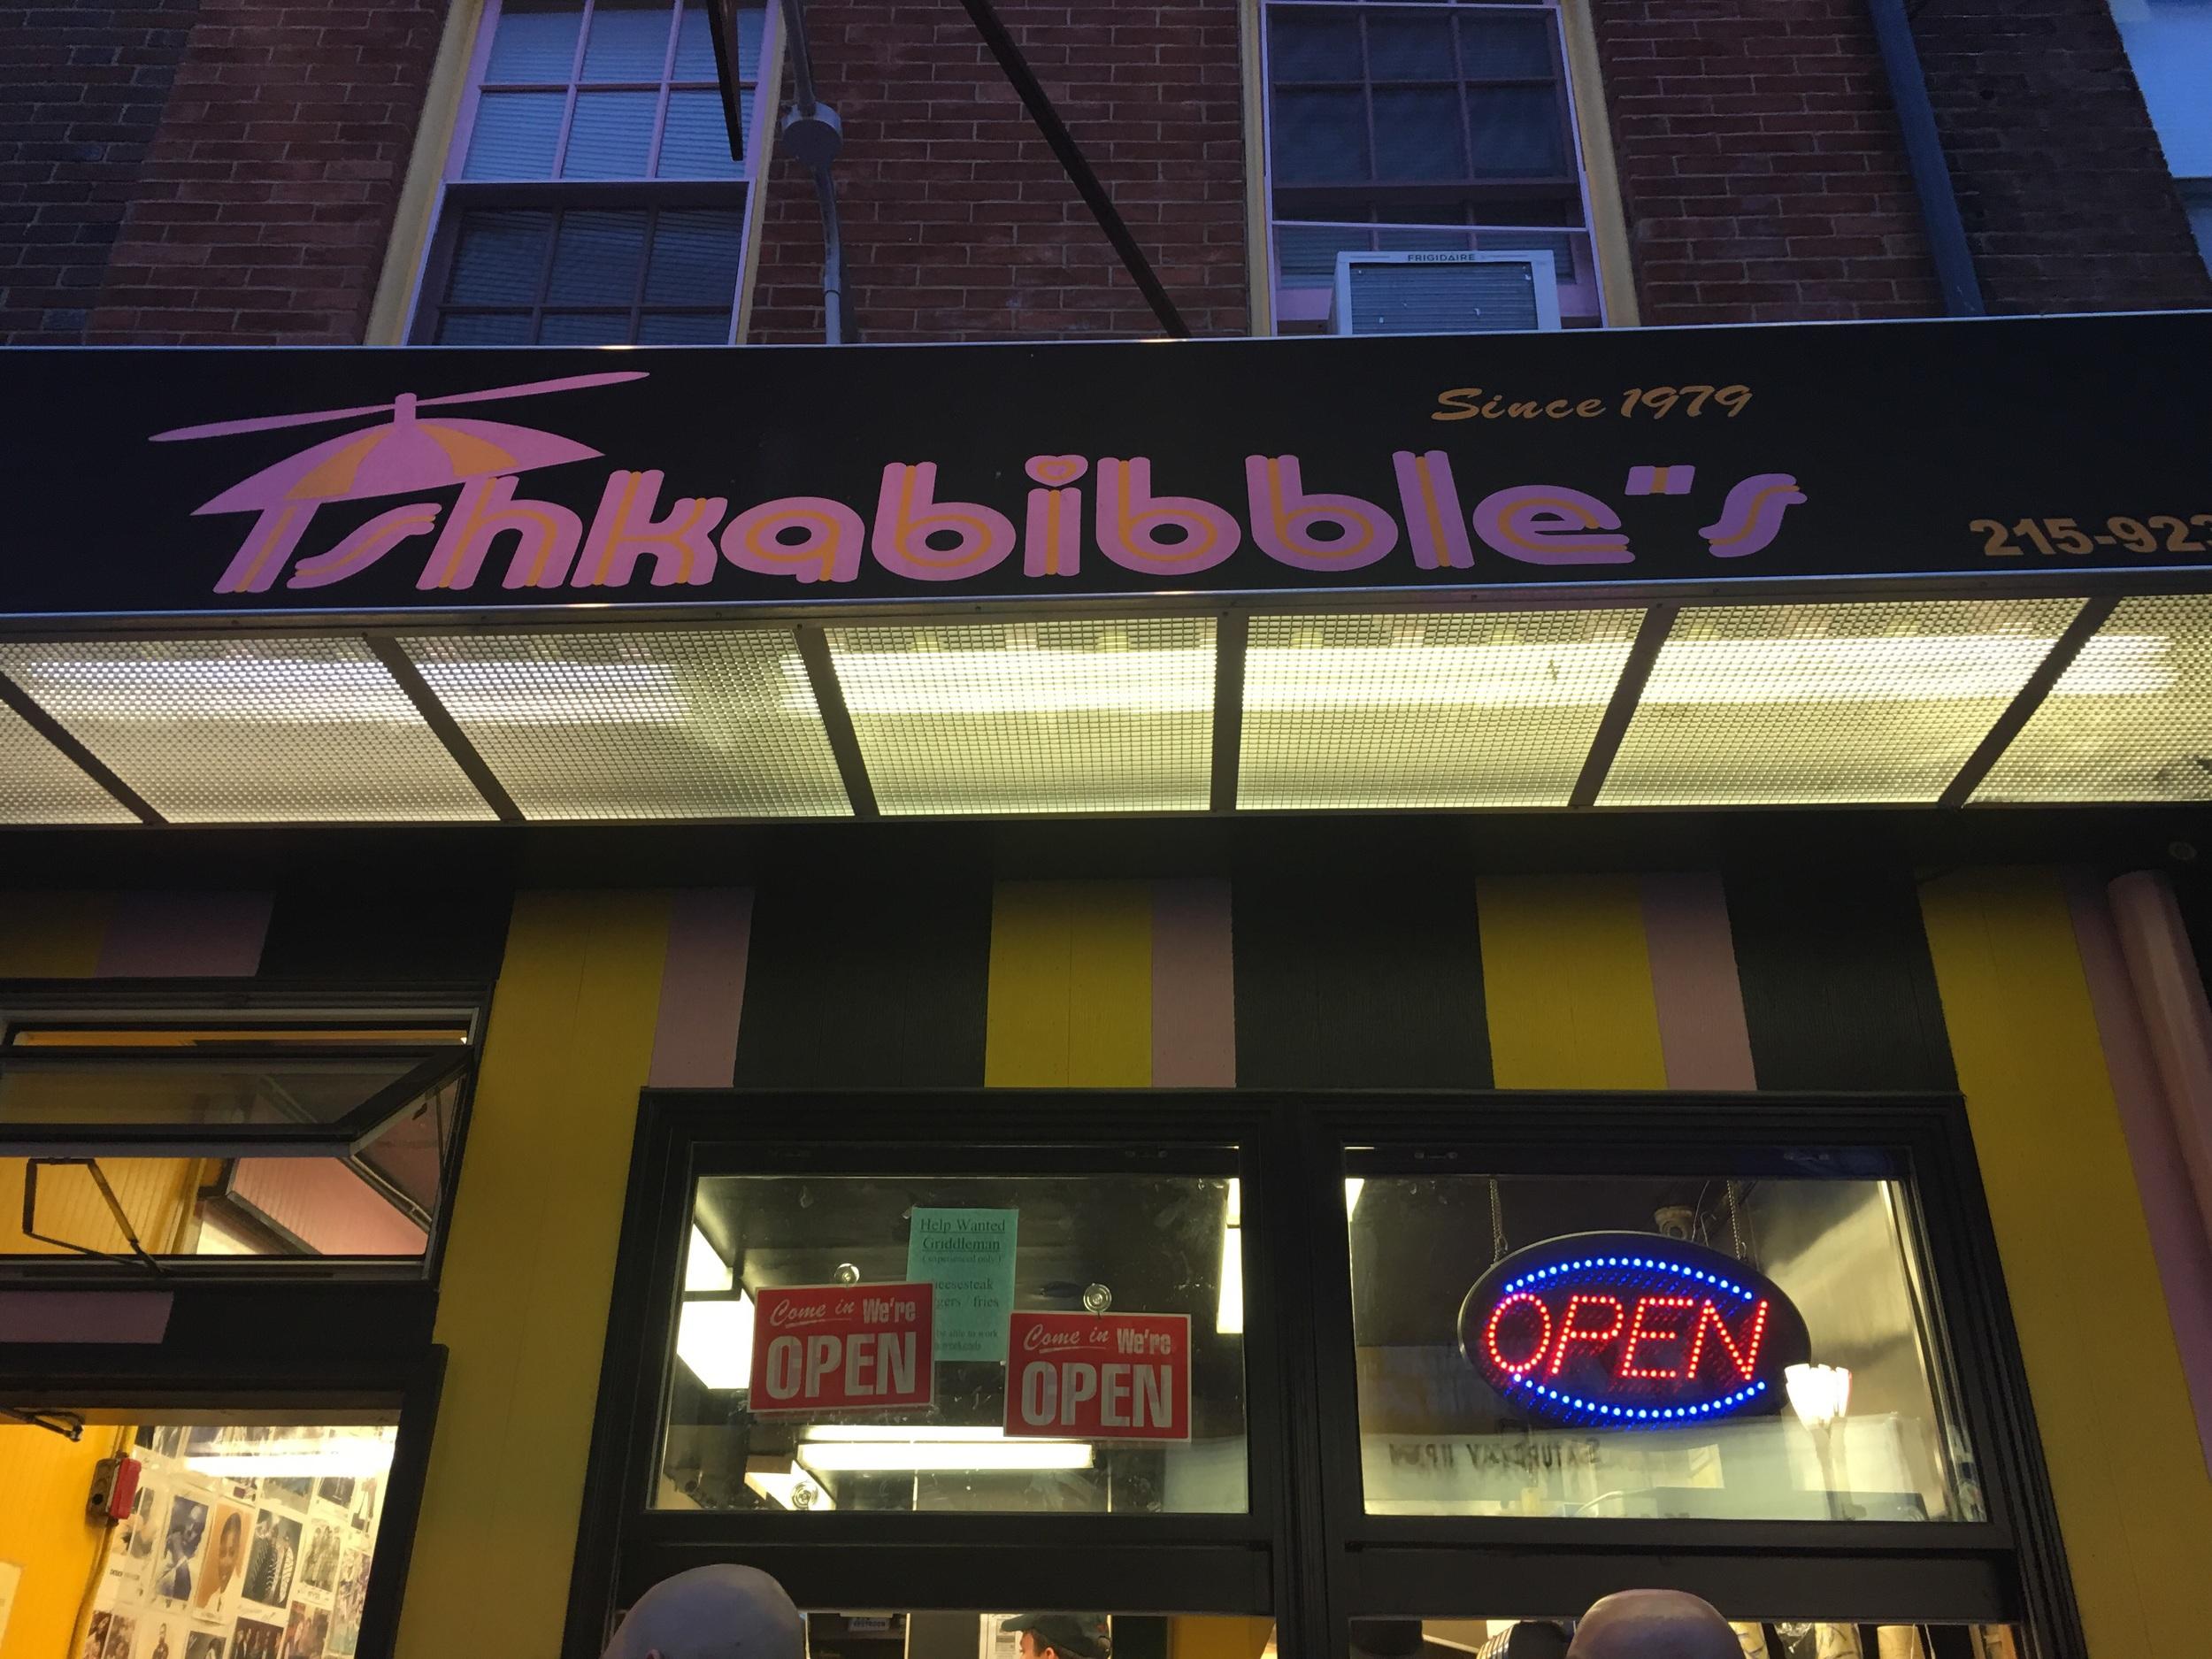 Ishkabibble's on South Street